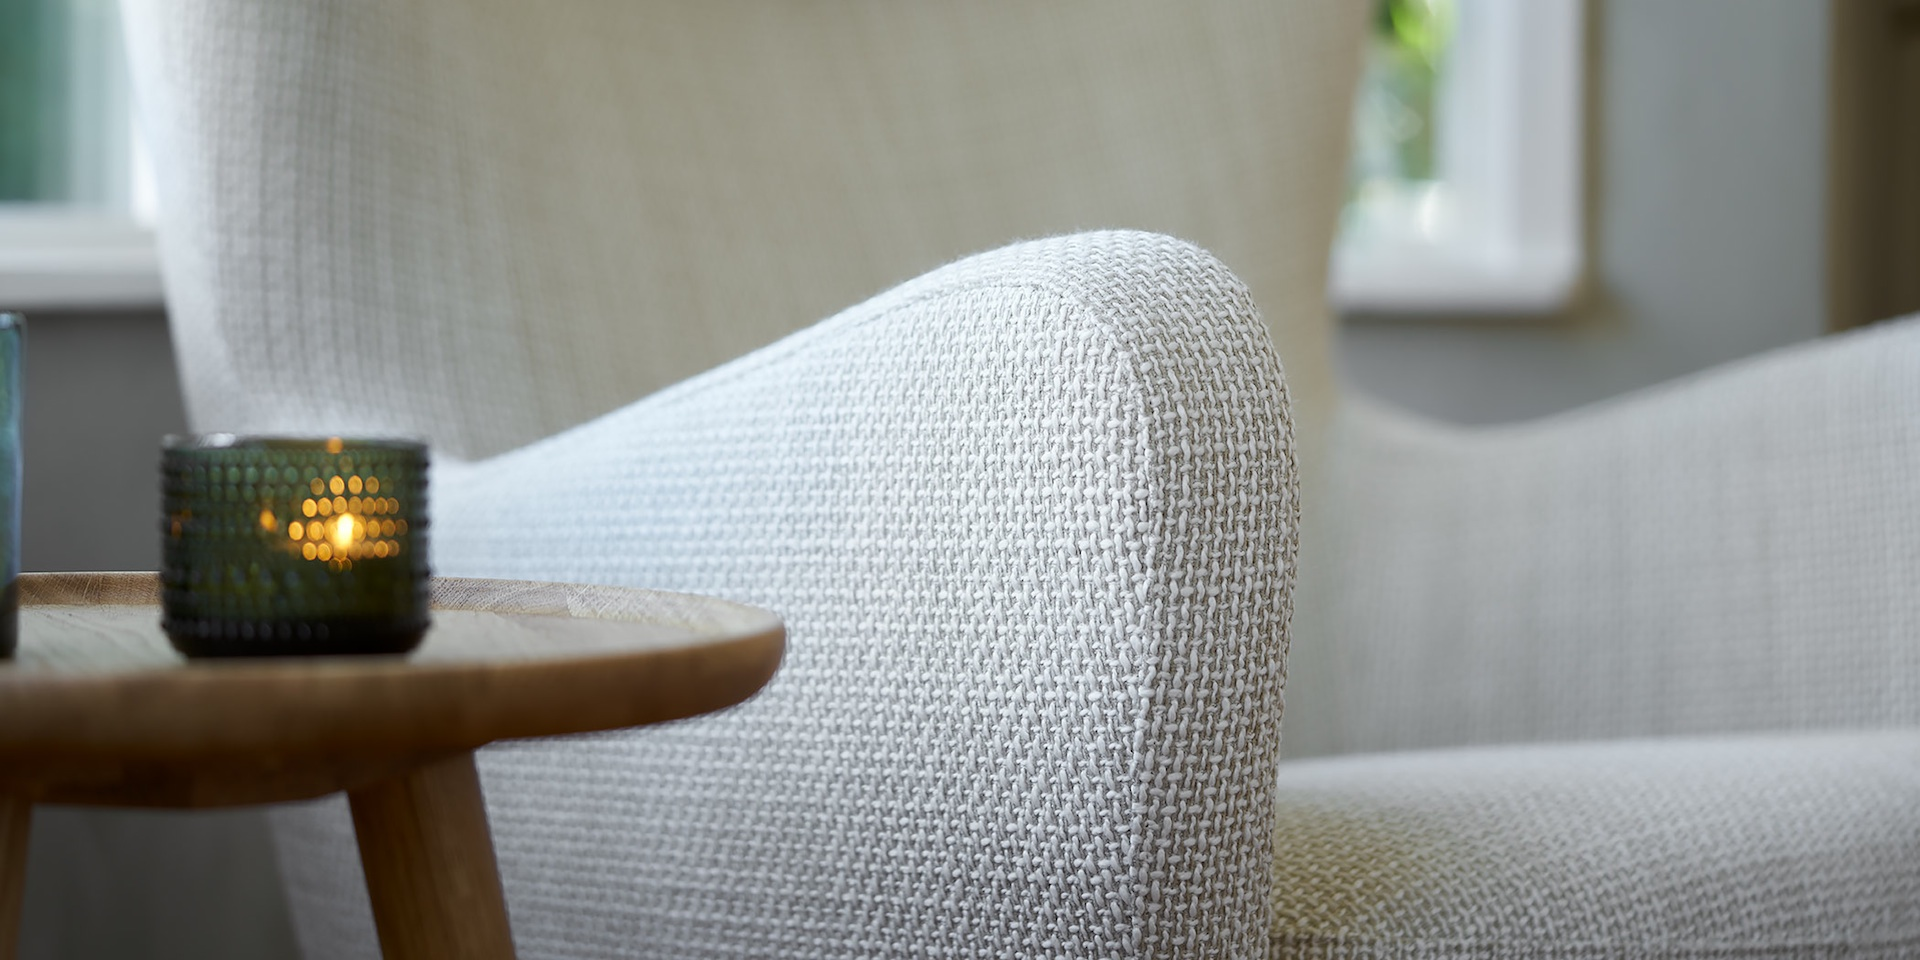 ELSA_arrangement_armchair_headrest_avatar1_natur_3ELSA_arrangement_armchair_headrest_avatar1_natur_3